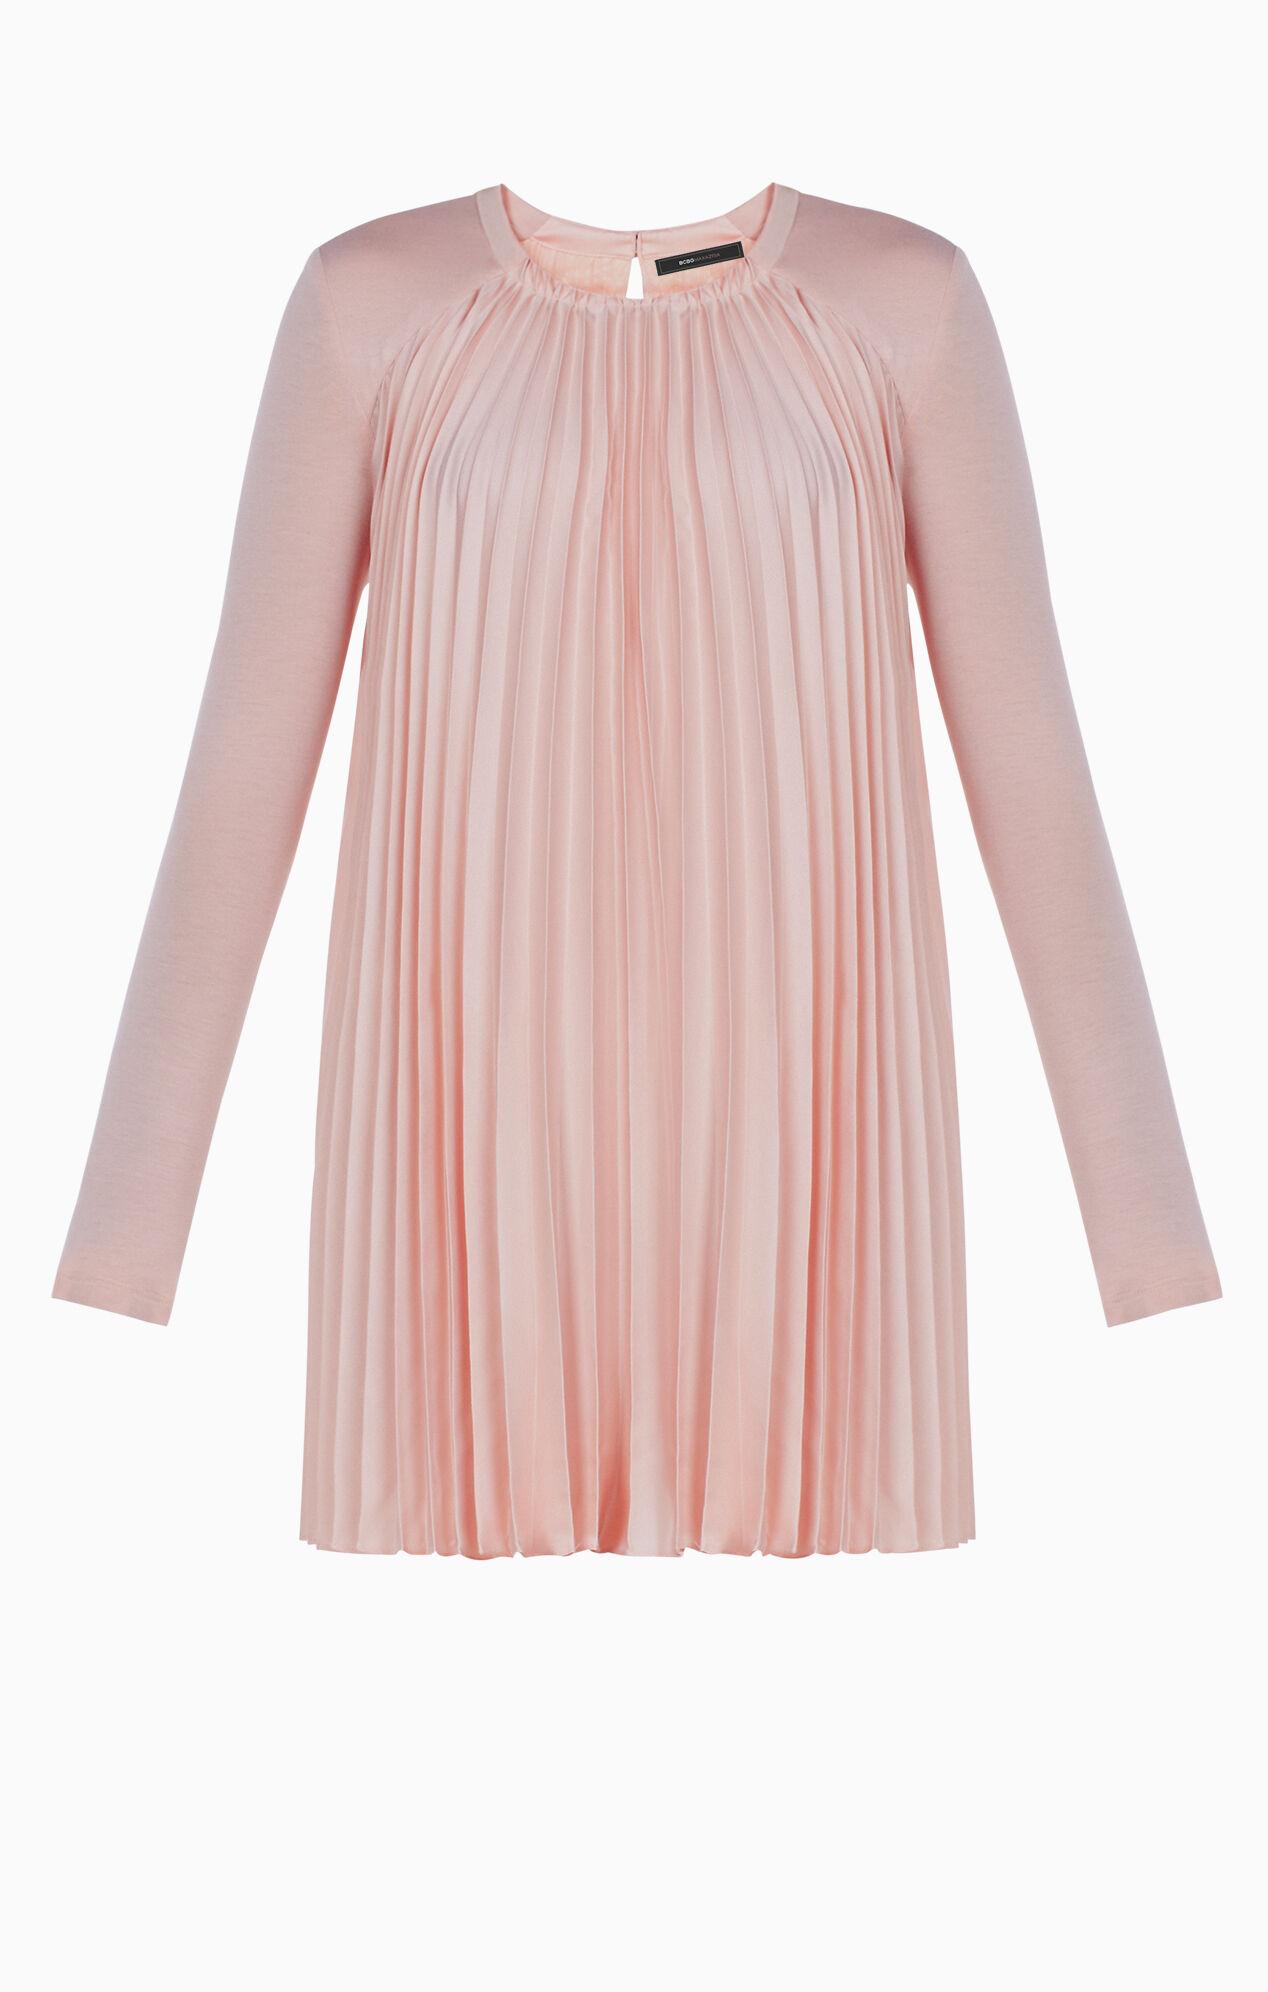 Cristina Pleated Dress